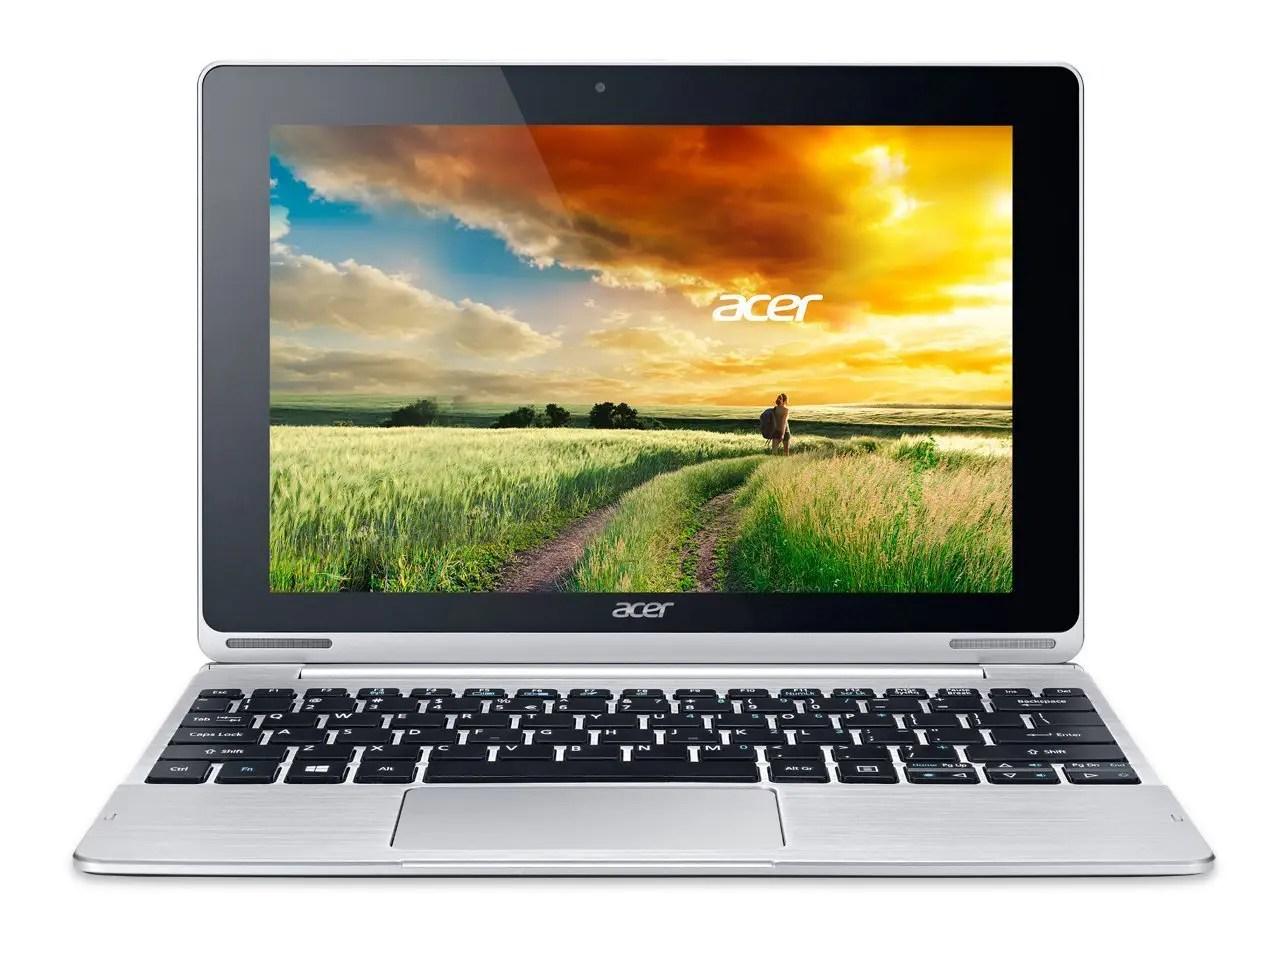 Acer Aspire Switch 10 SW5-015-198P 10.1-inch Reviews - LaptopNinja